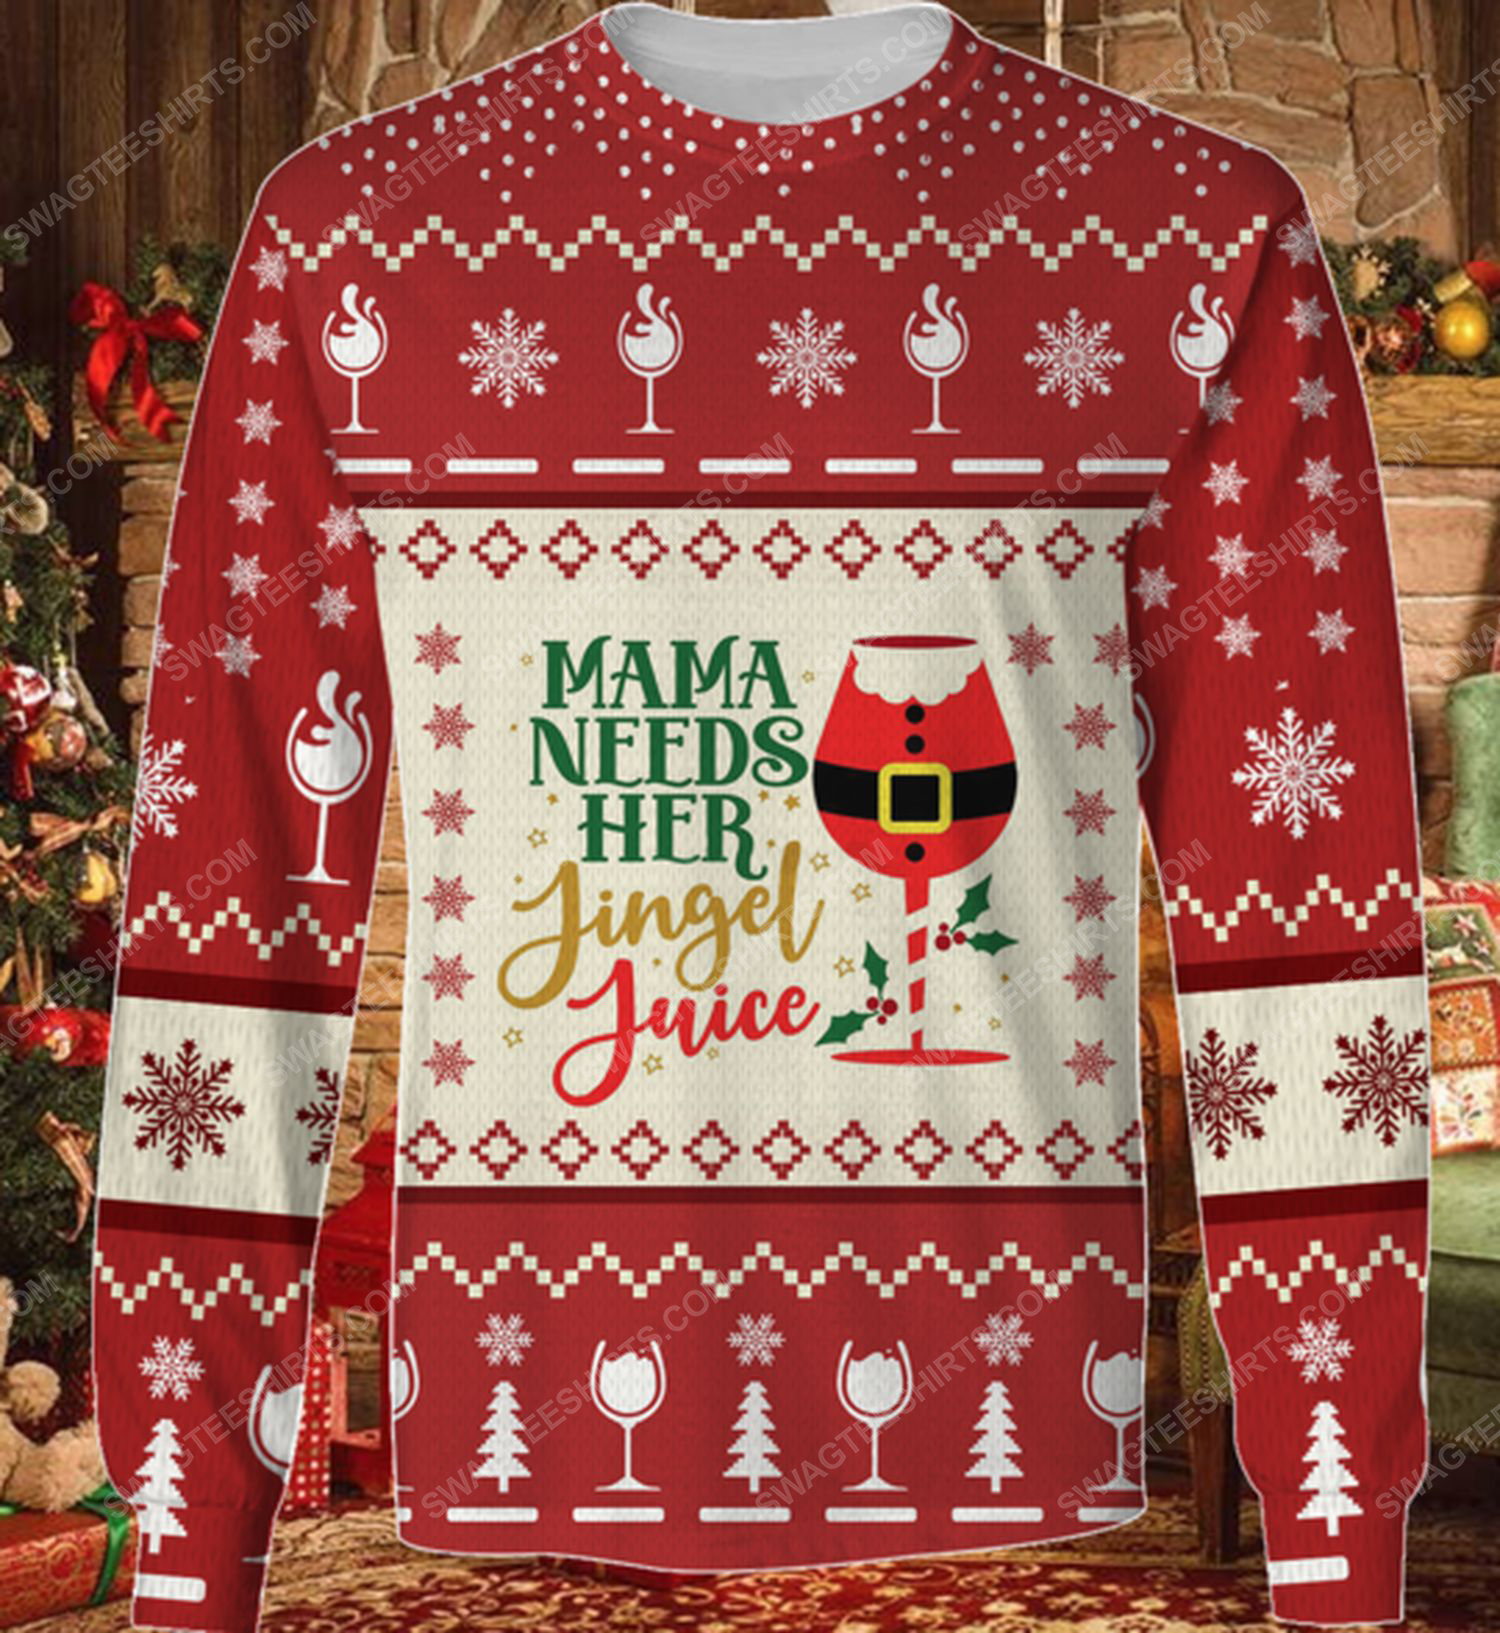 Mama needs her jiggle juice ugly christmas sweater 2